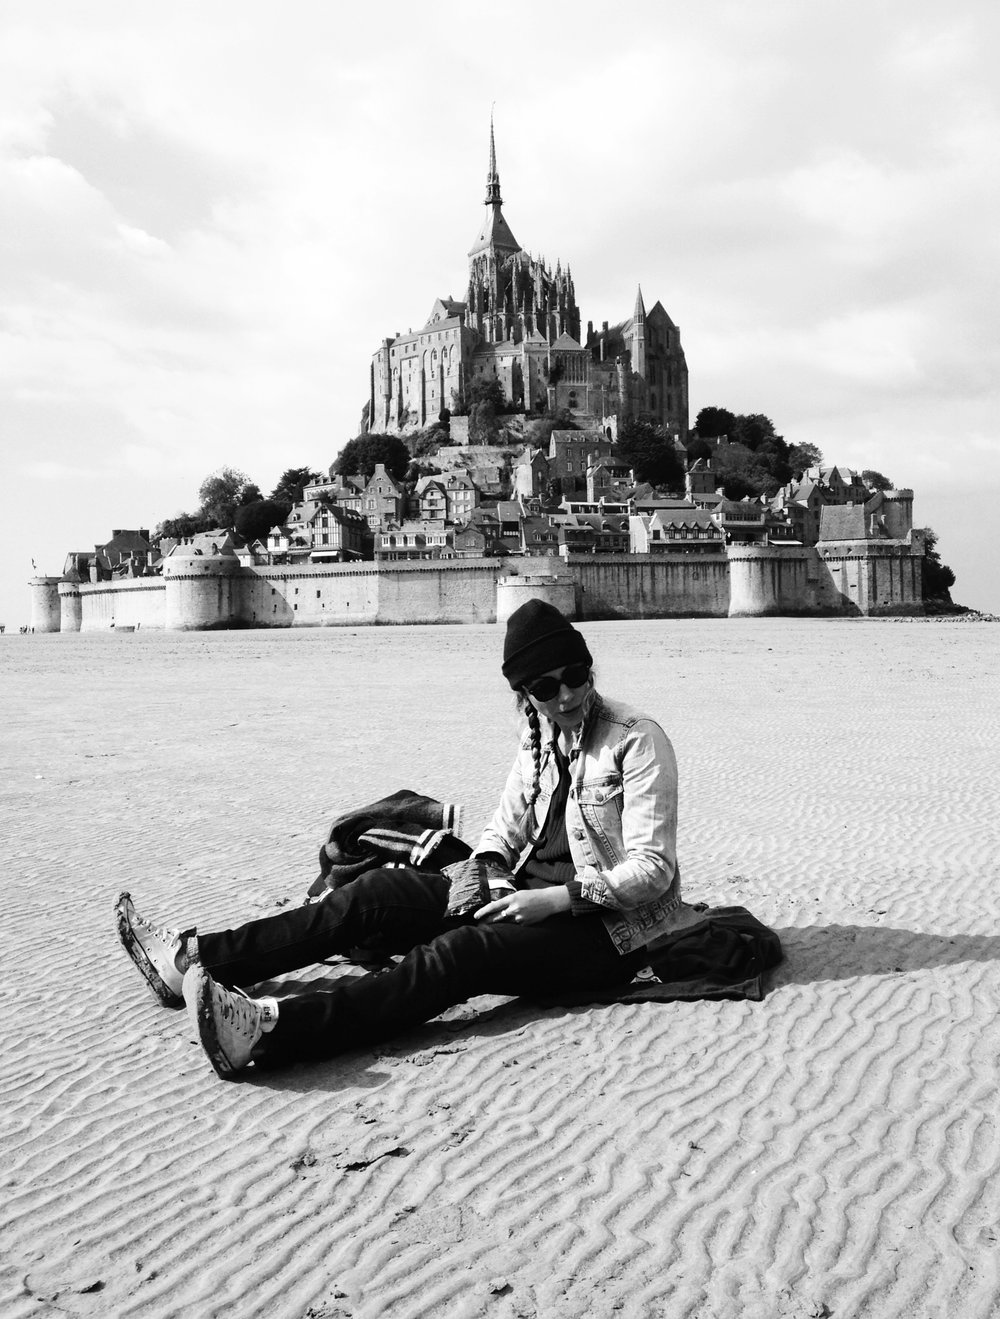 Human and Mont Saint Michel